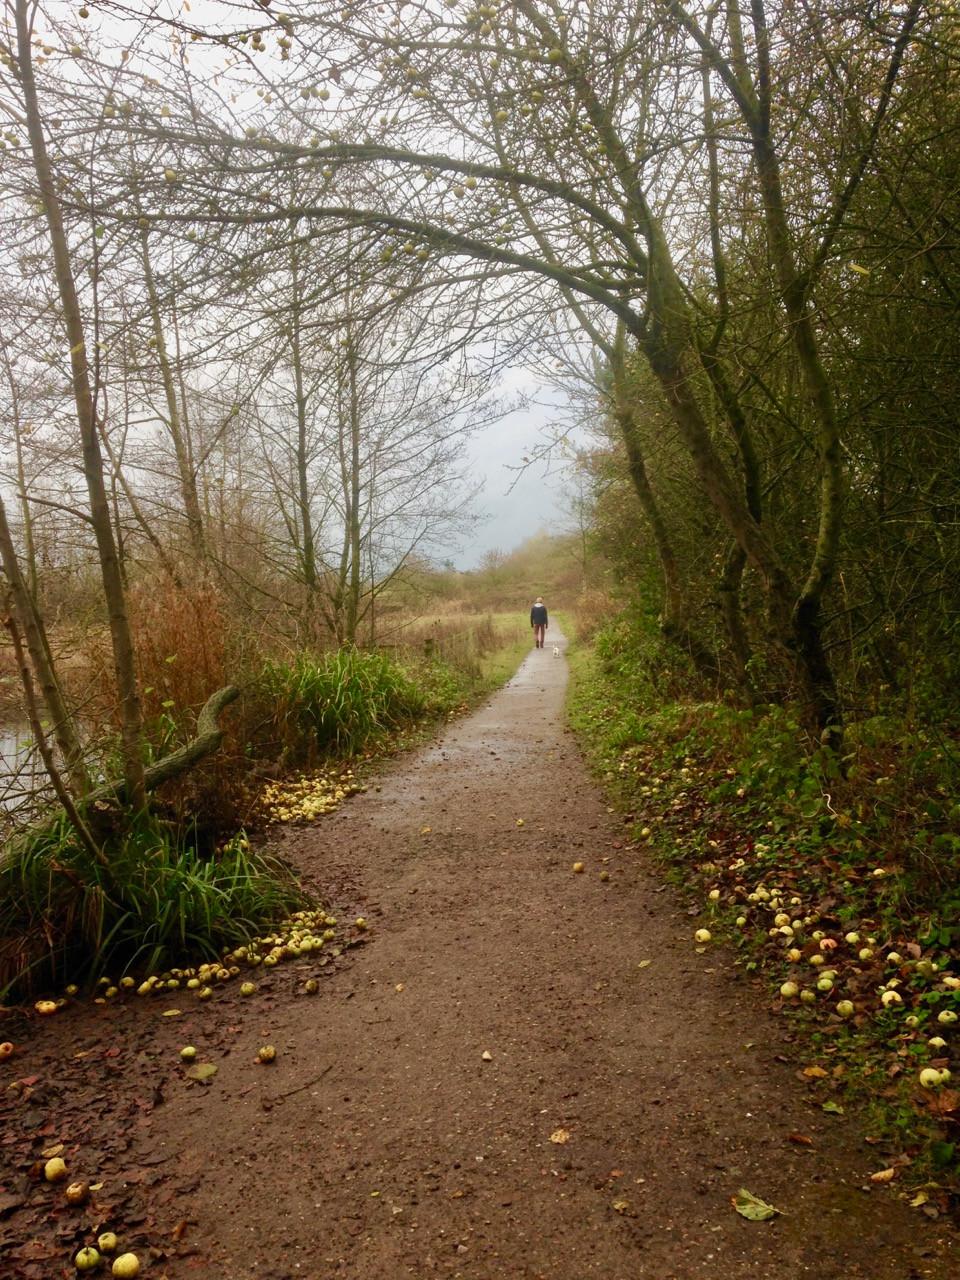 Footpath among fallen apples